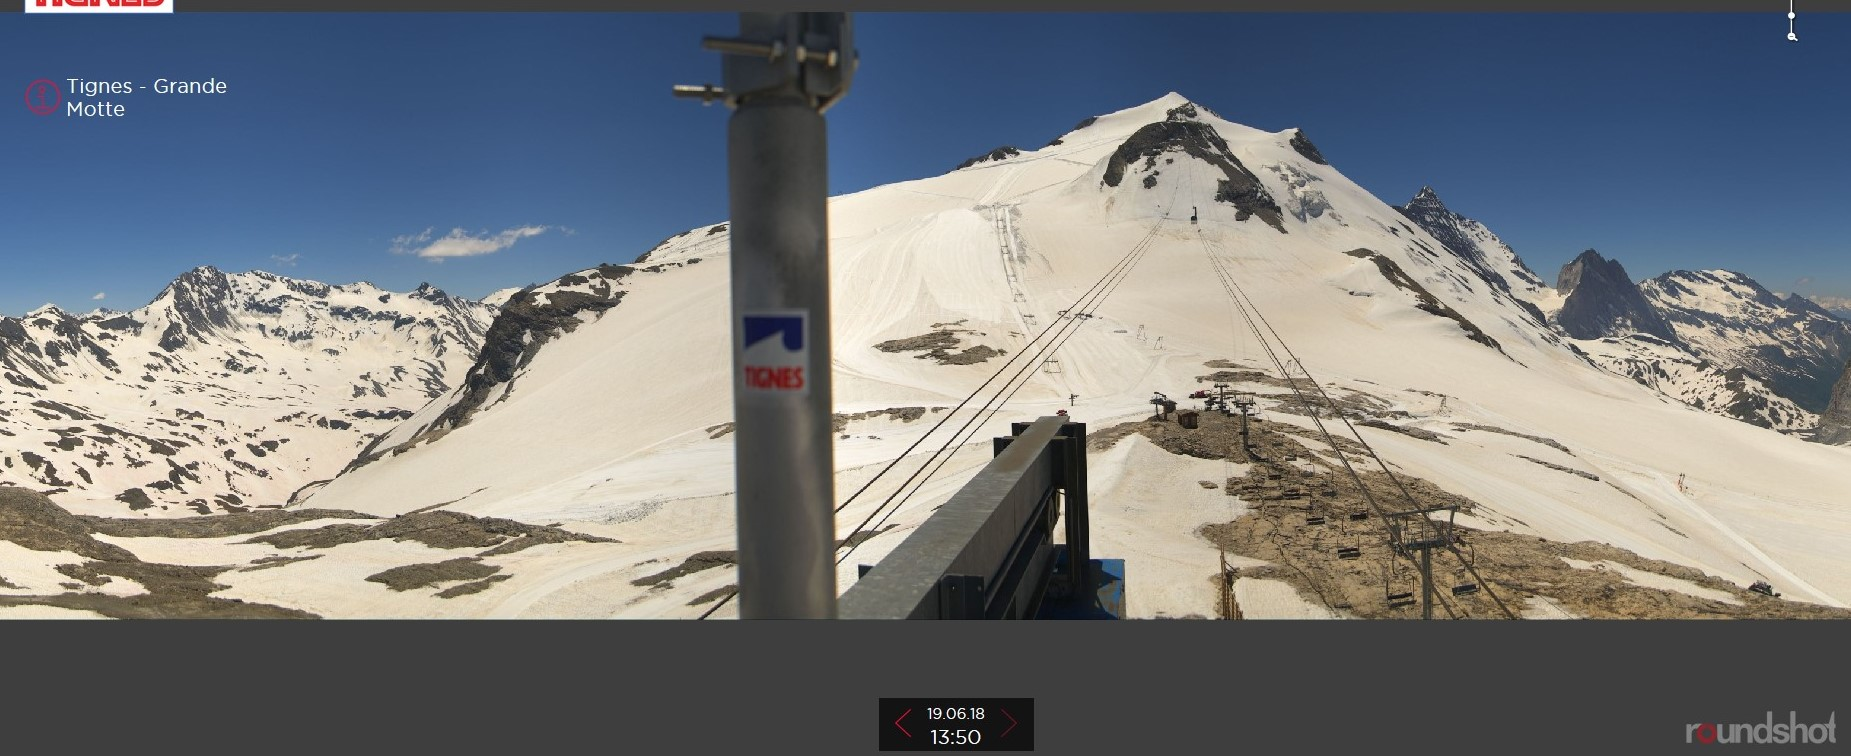 Nowcasting nivoglaciale Alpi estate 2018-grande-motte-19.06.18.jpg